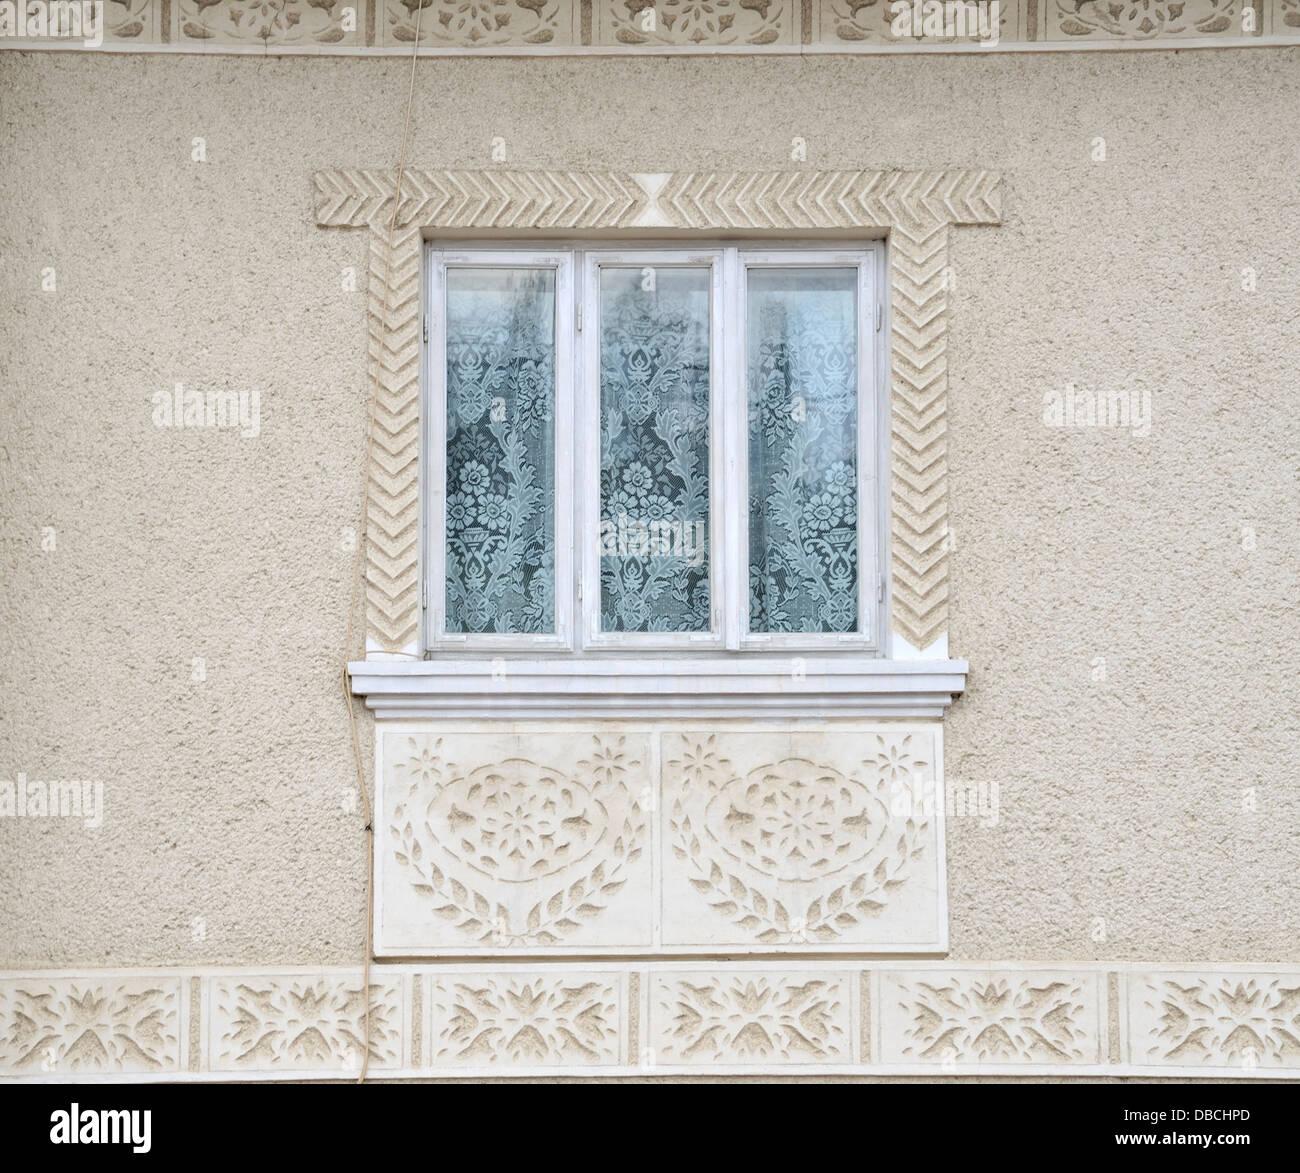 Window, Bukovina, Romania - Stock Image